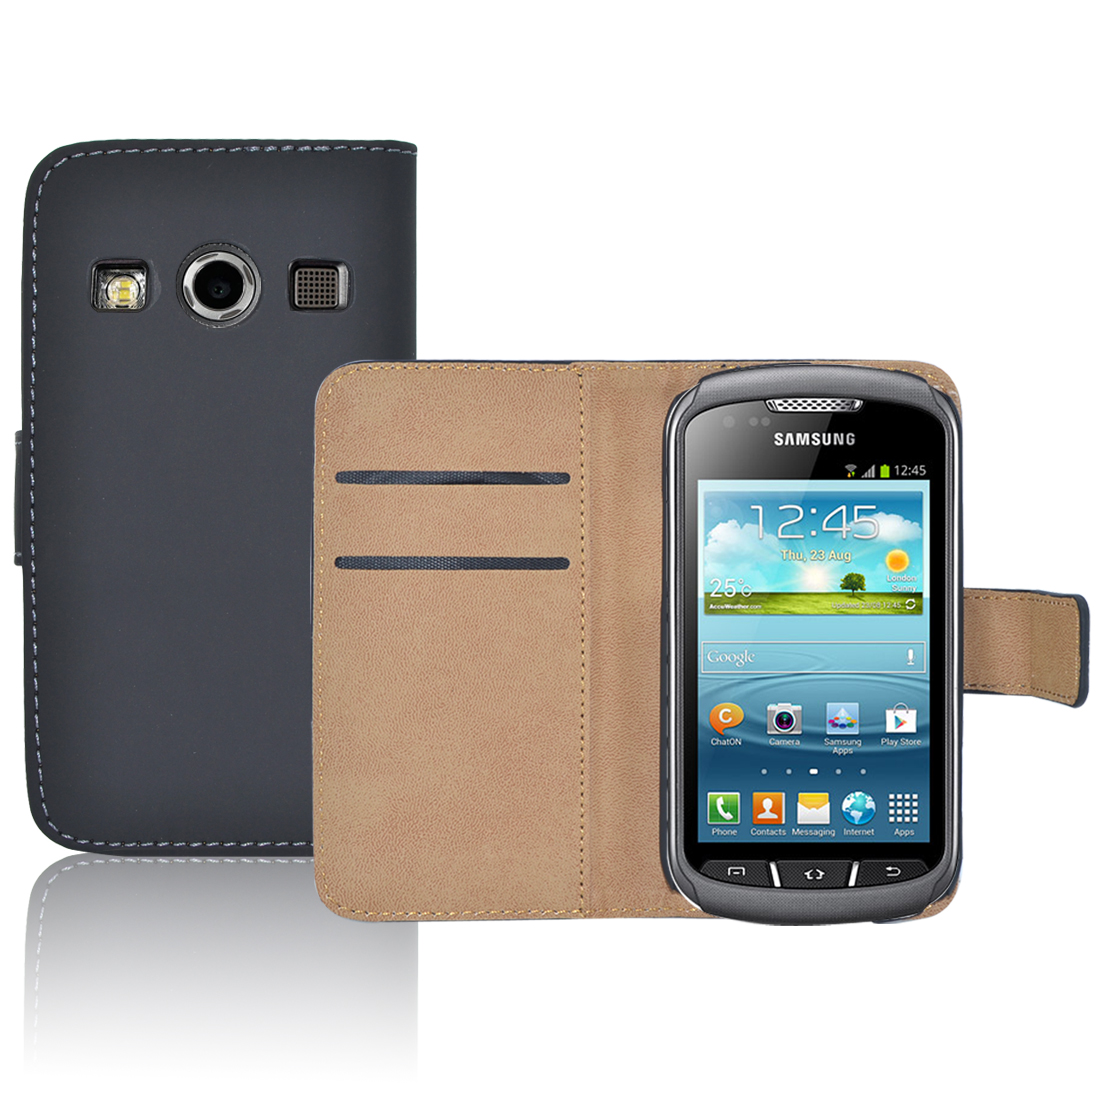 Pouzdro pro Samsung Galaxy Xcover 2 S7710 černé